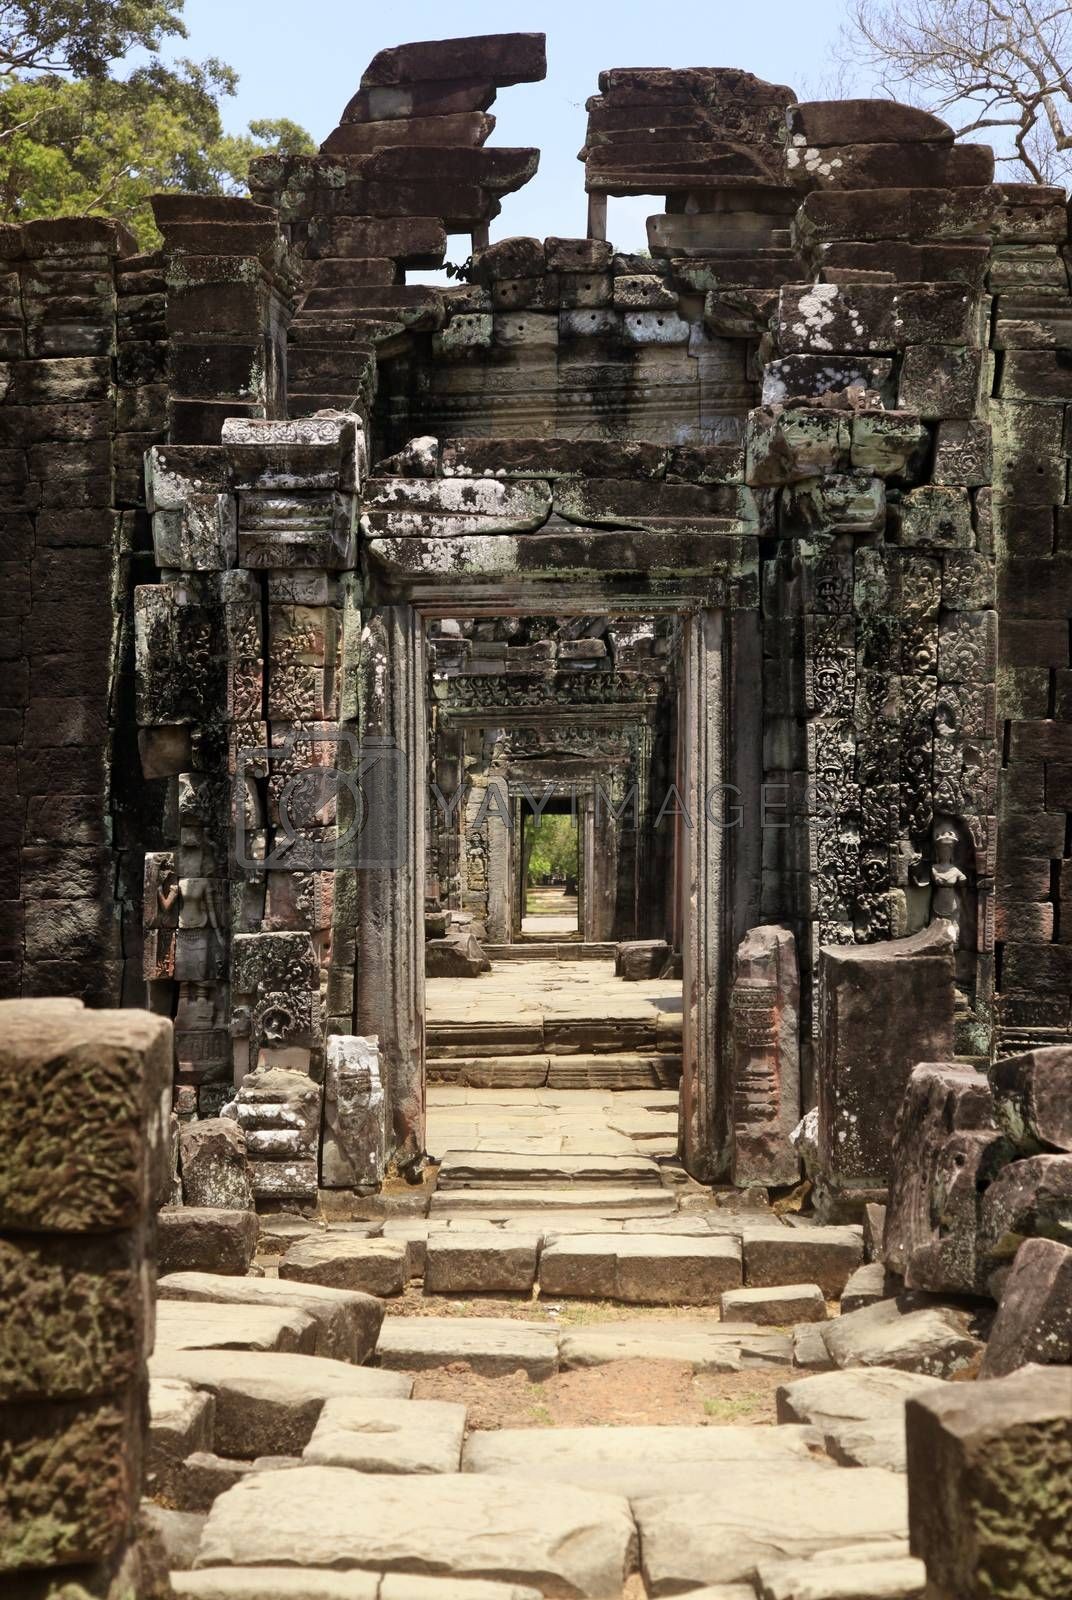 Long corridor of pillars in temple ruins. Angkor wat